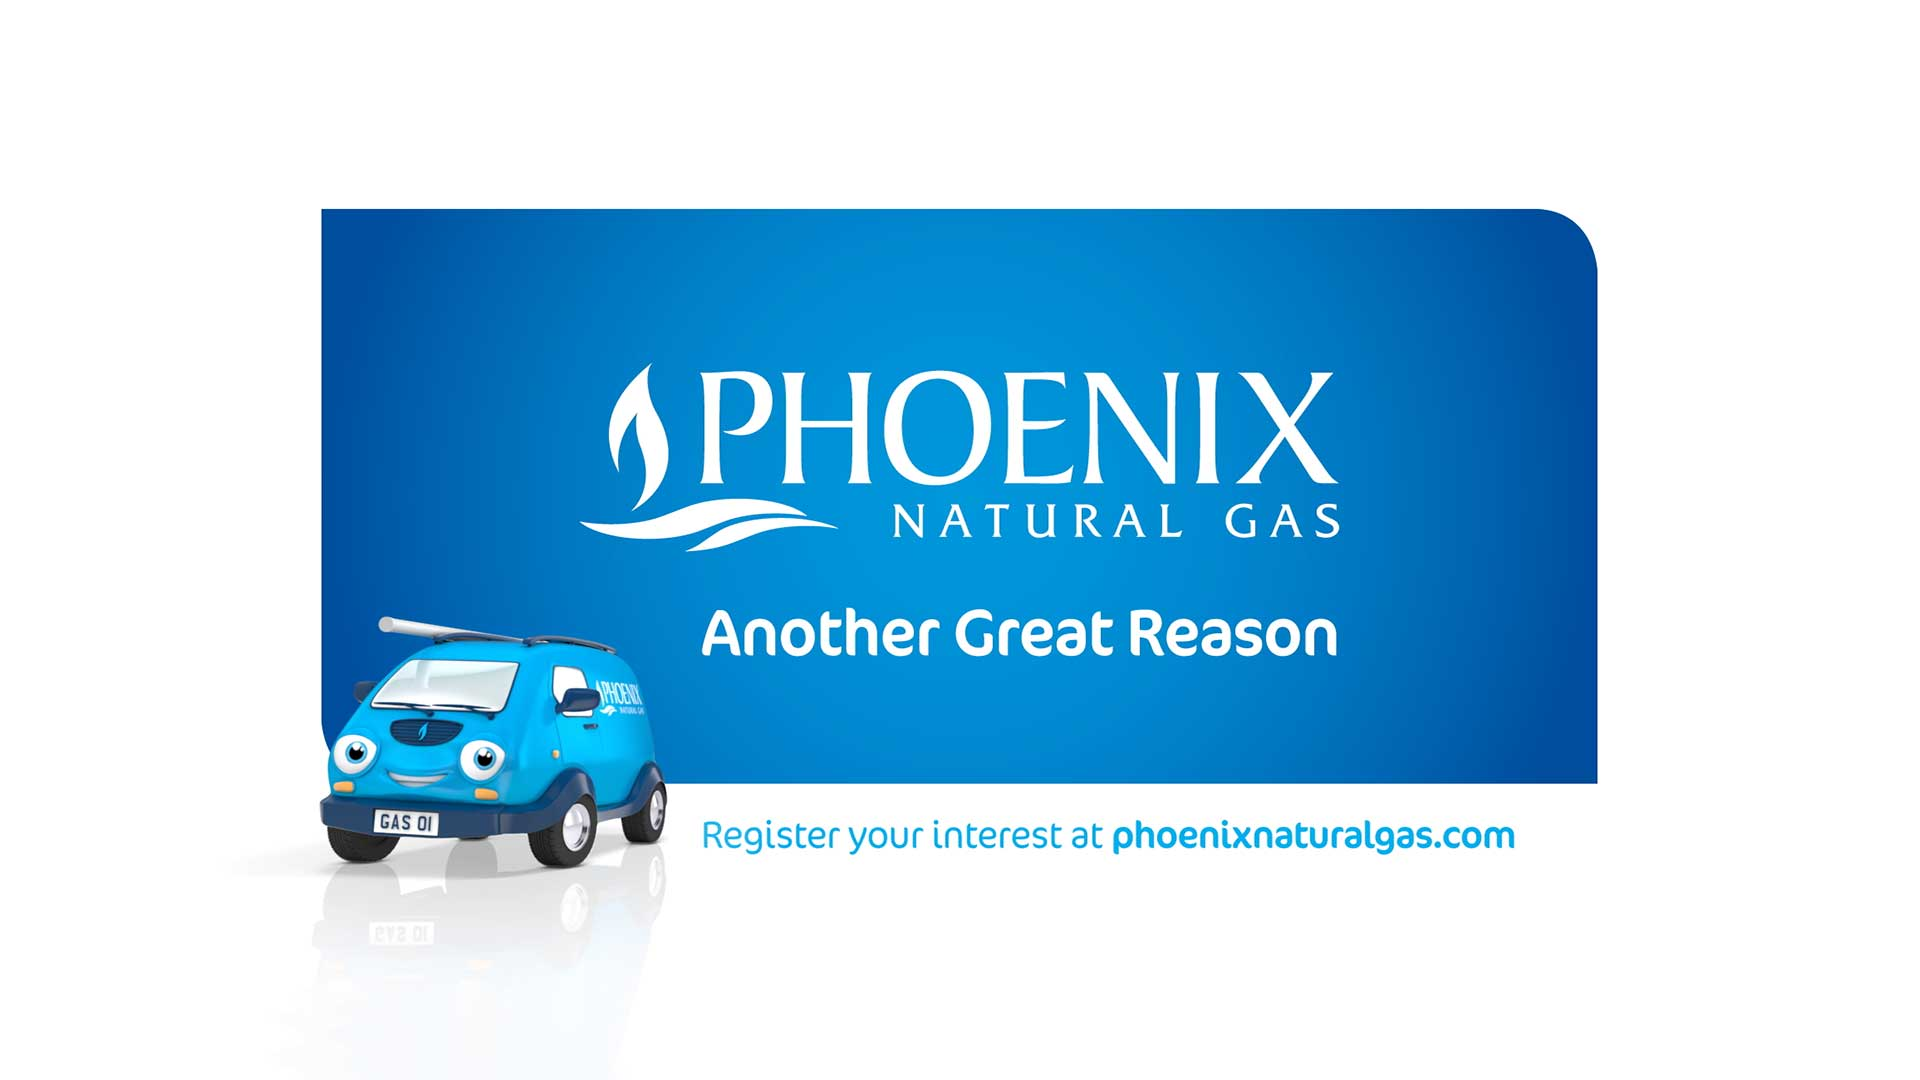 Phoenix_Natural_Gas_2